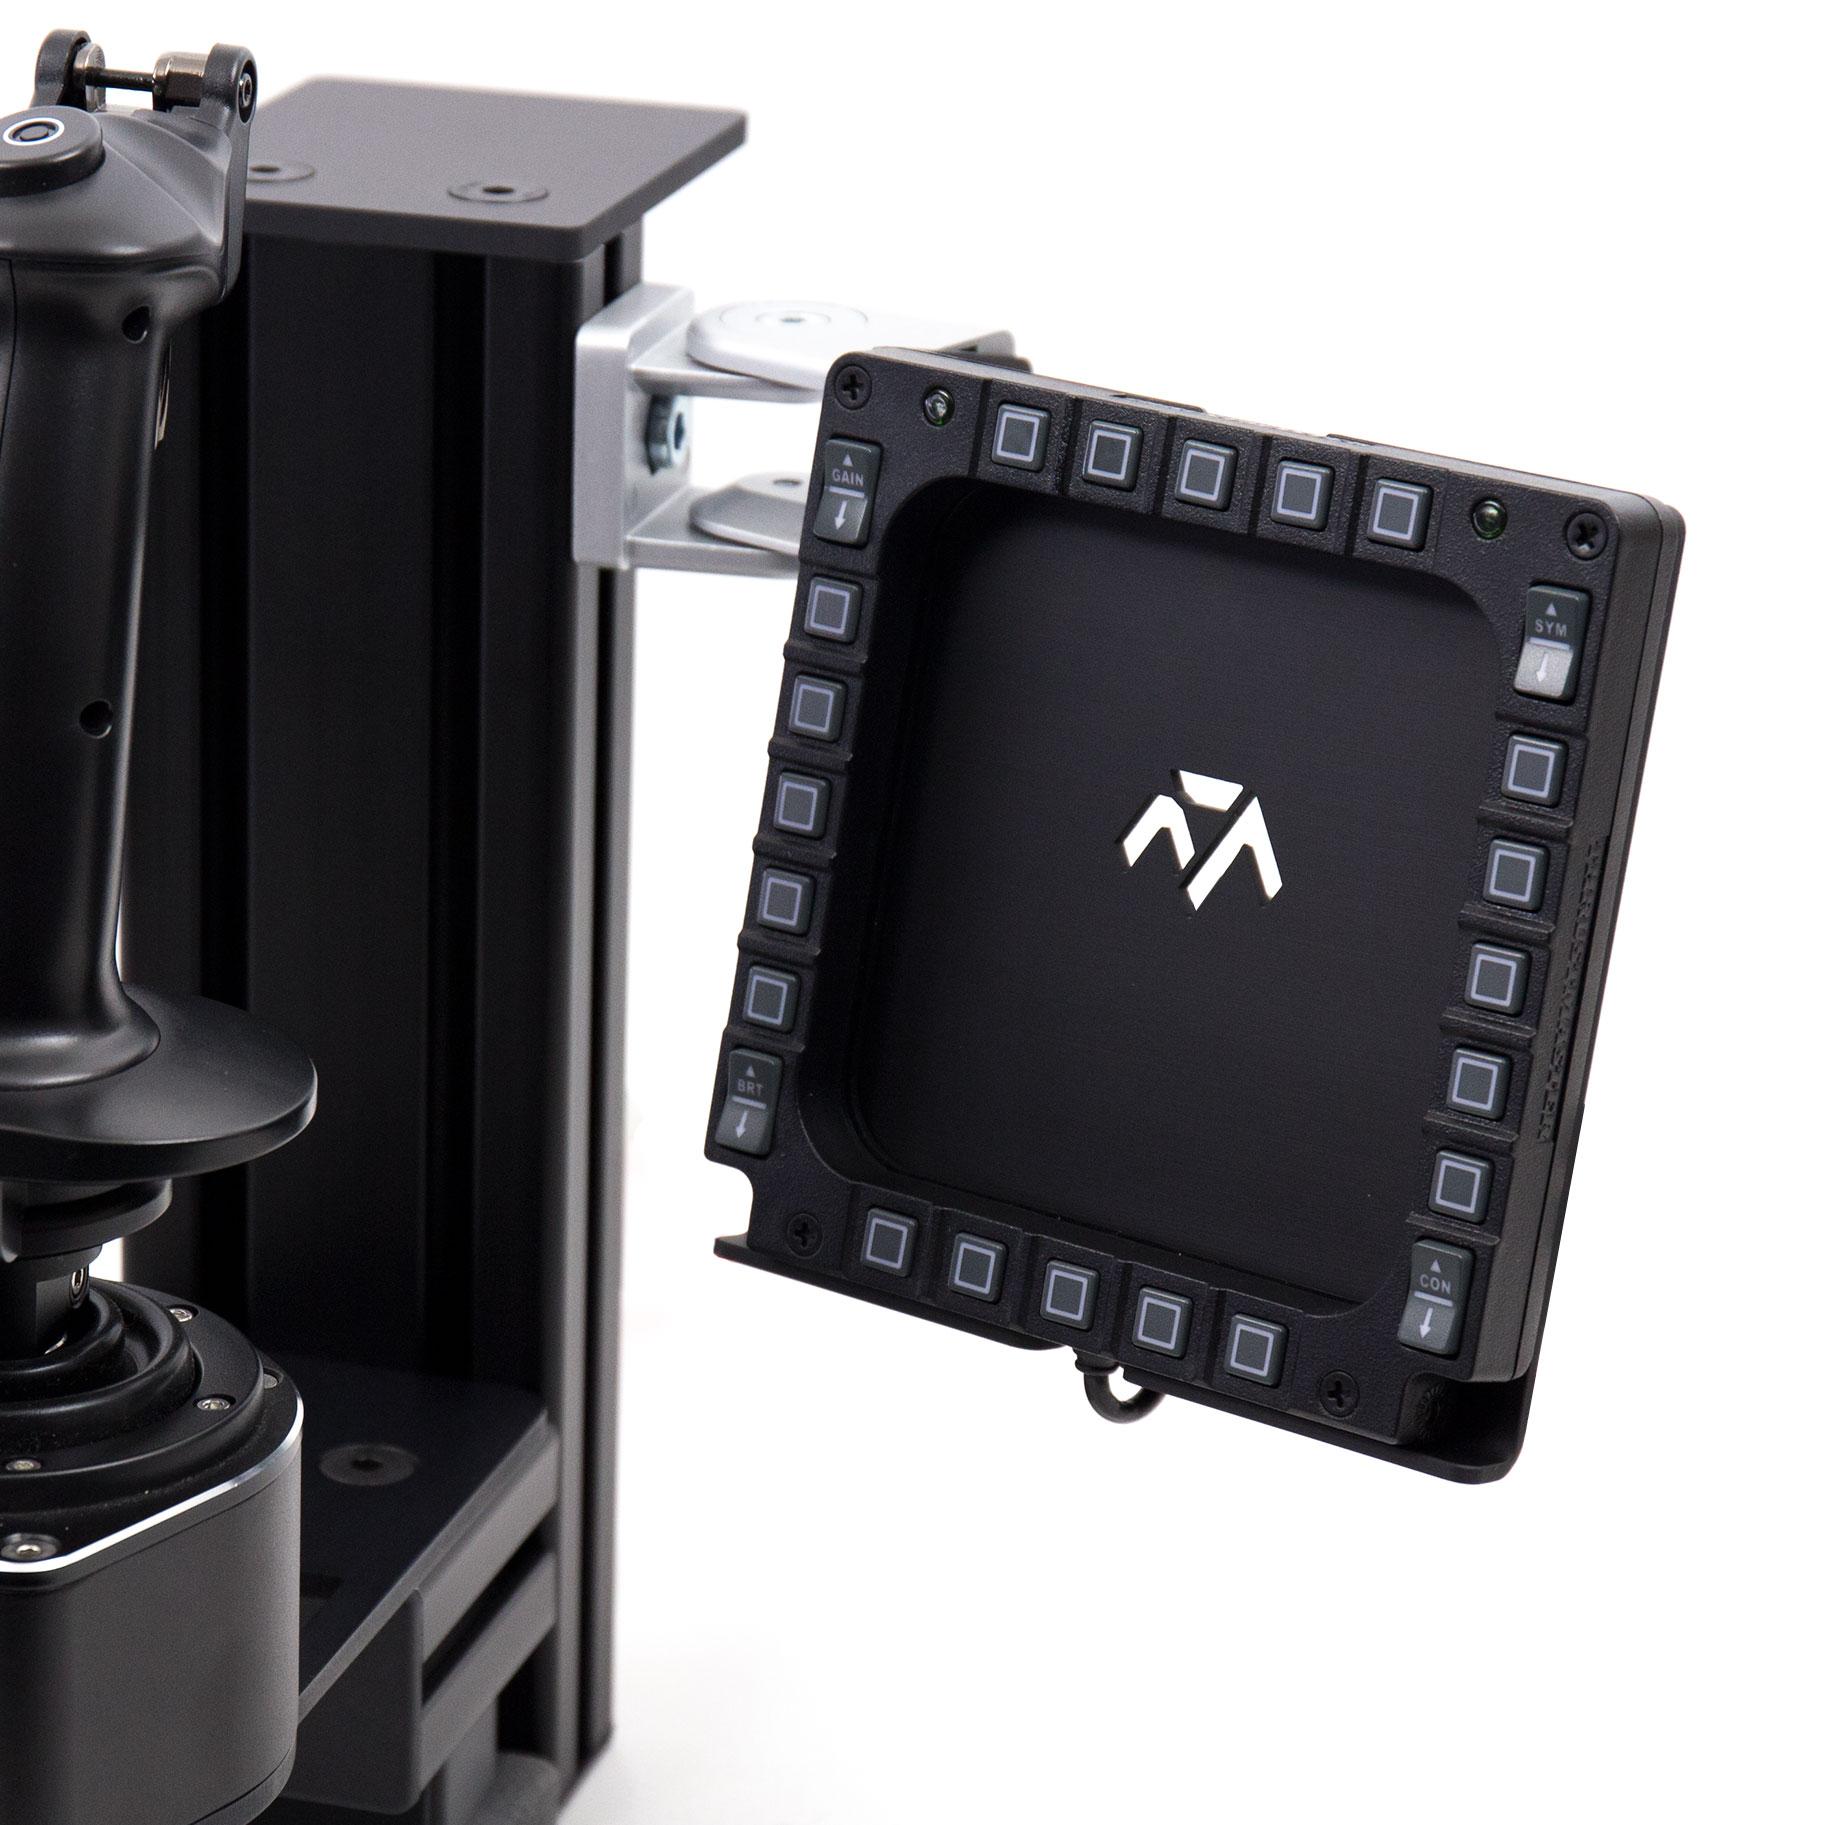 MonsterTech Joystick/HOTAS Table Mounts Review | Mudspike